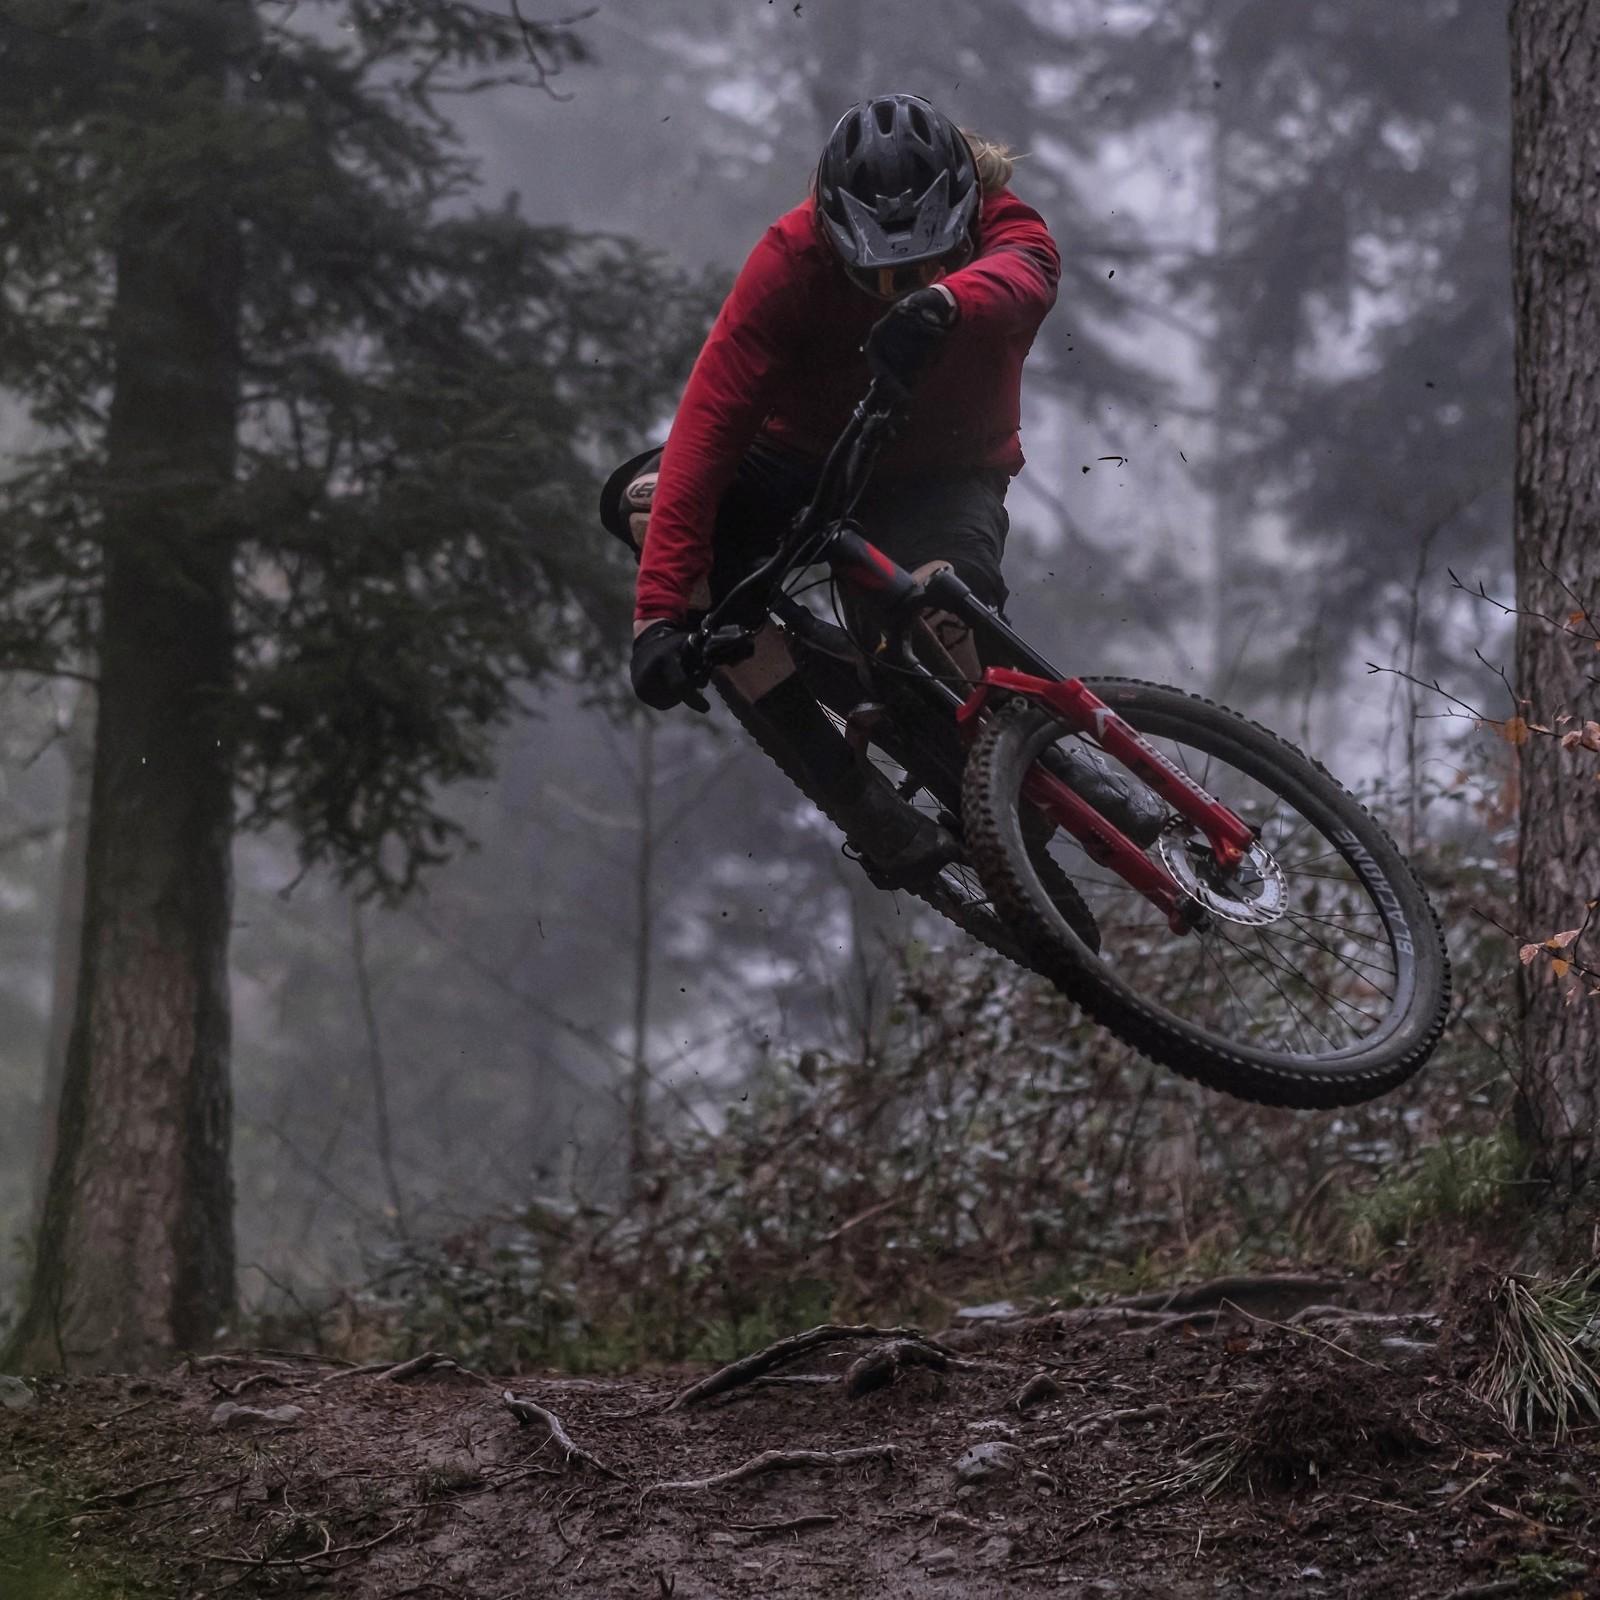 Eurotable - Lucas_Bruder - Mountain Biking Pictures - Vital MTB